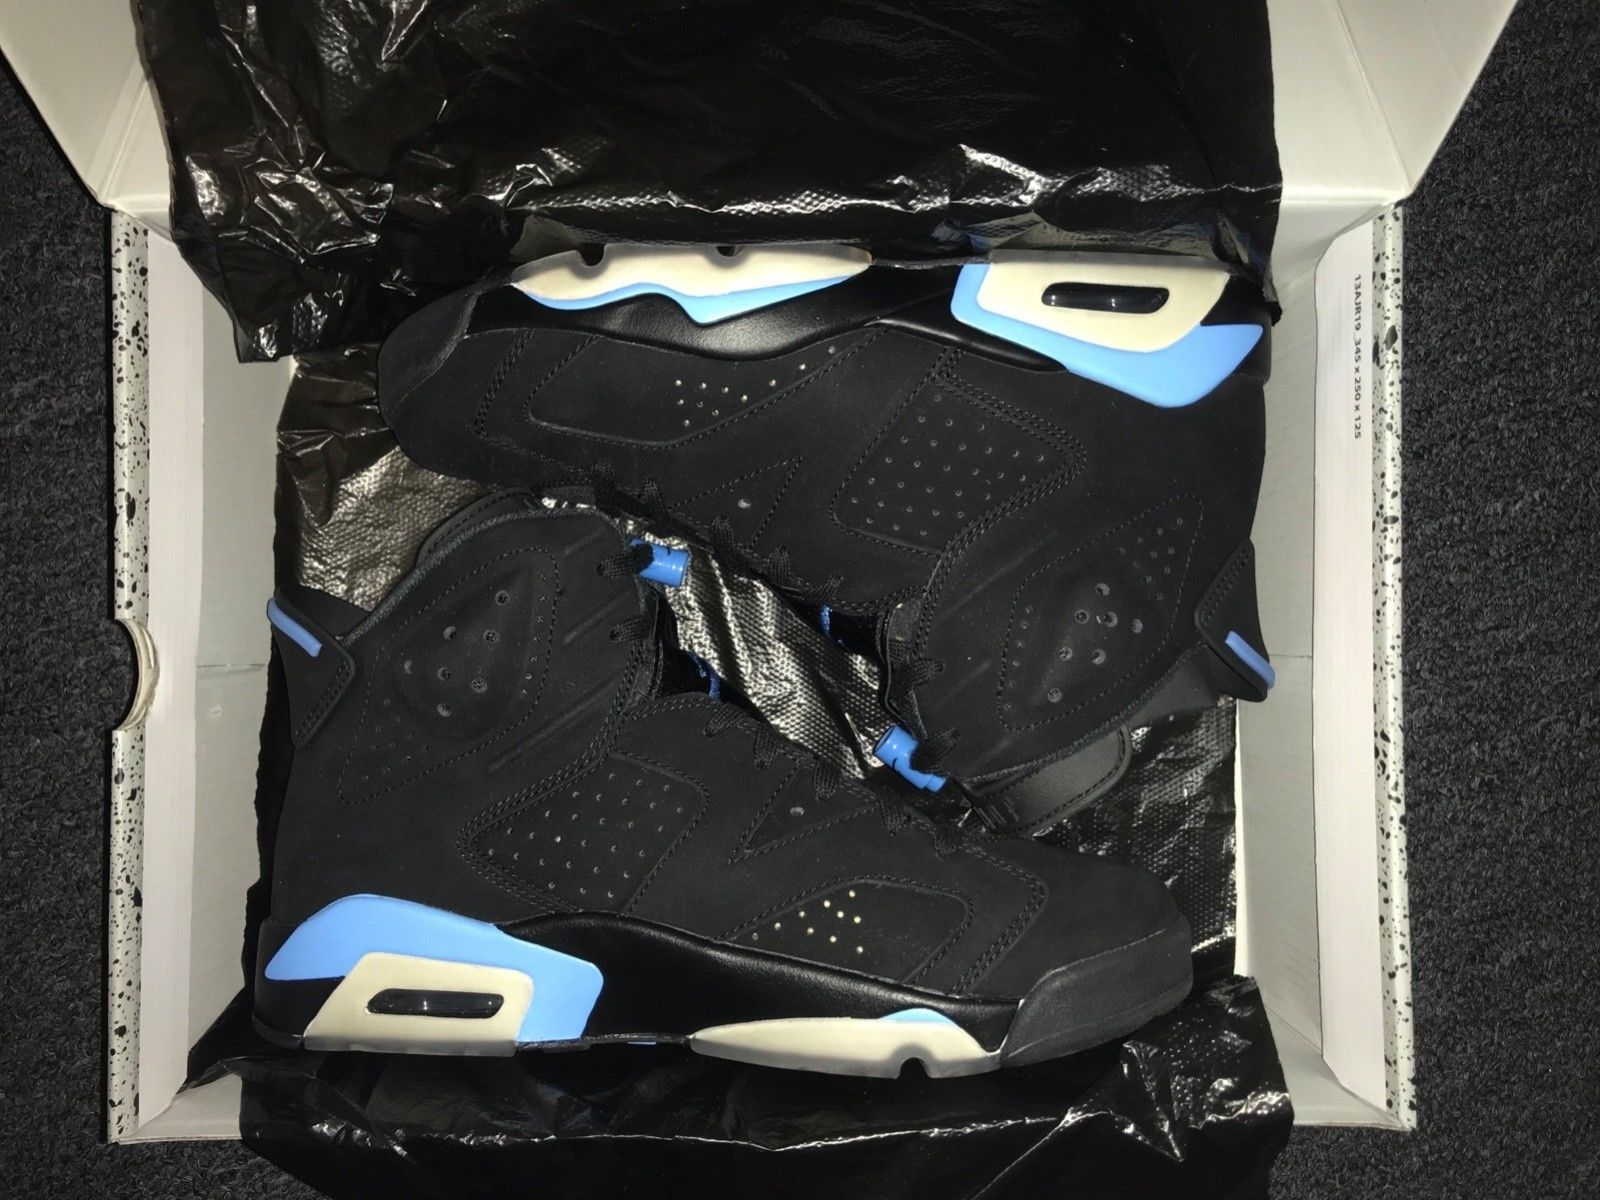 Nike Air Jordan 6 Retro Unc Black University Blue Size 9 Air Jordans Jordans Air Jordan 9